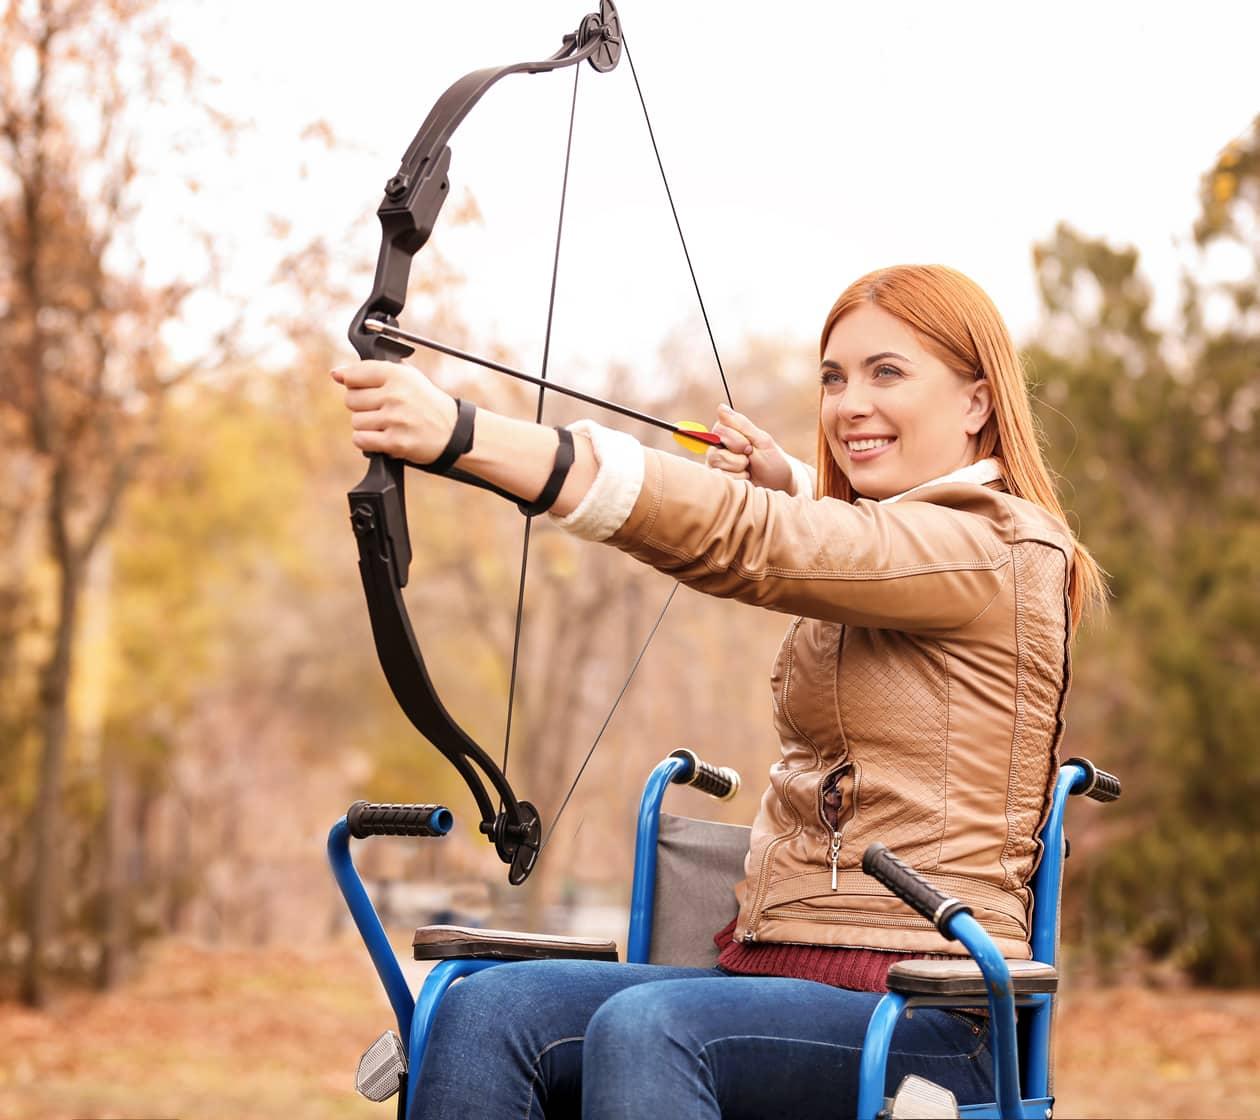 woman in wheelchair doing archery